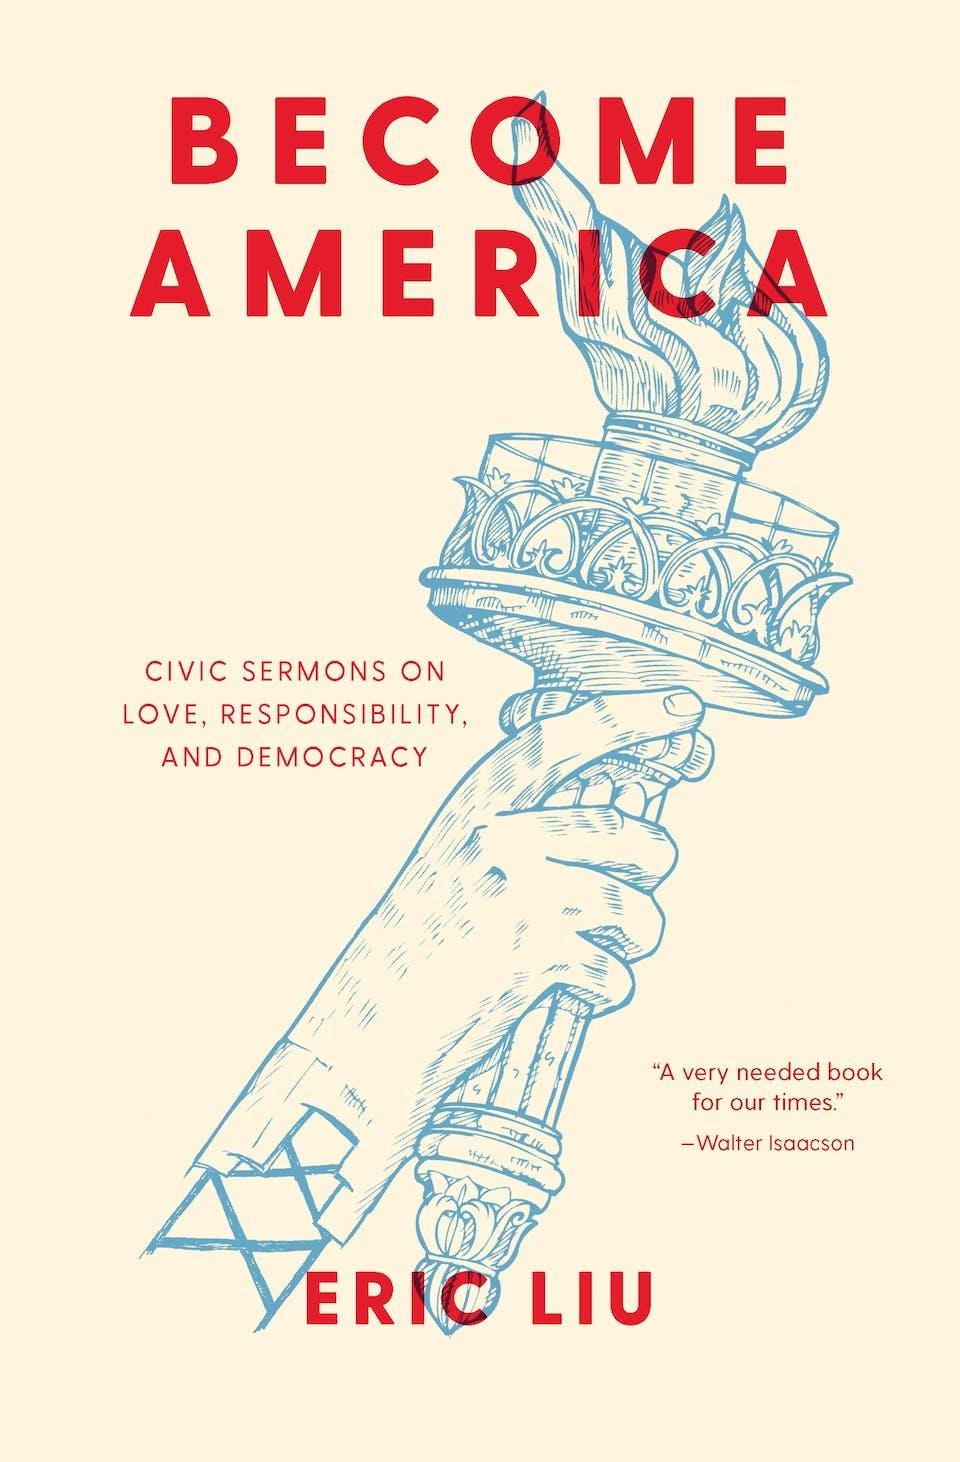 Eric Liu Book Talk: Civic Sermons on Love, Responsibility, and Democracy